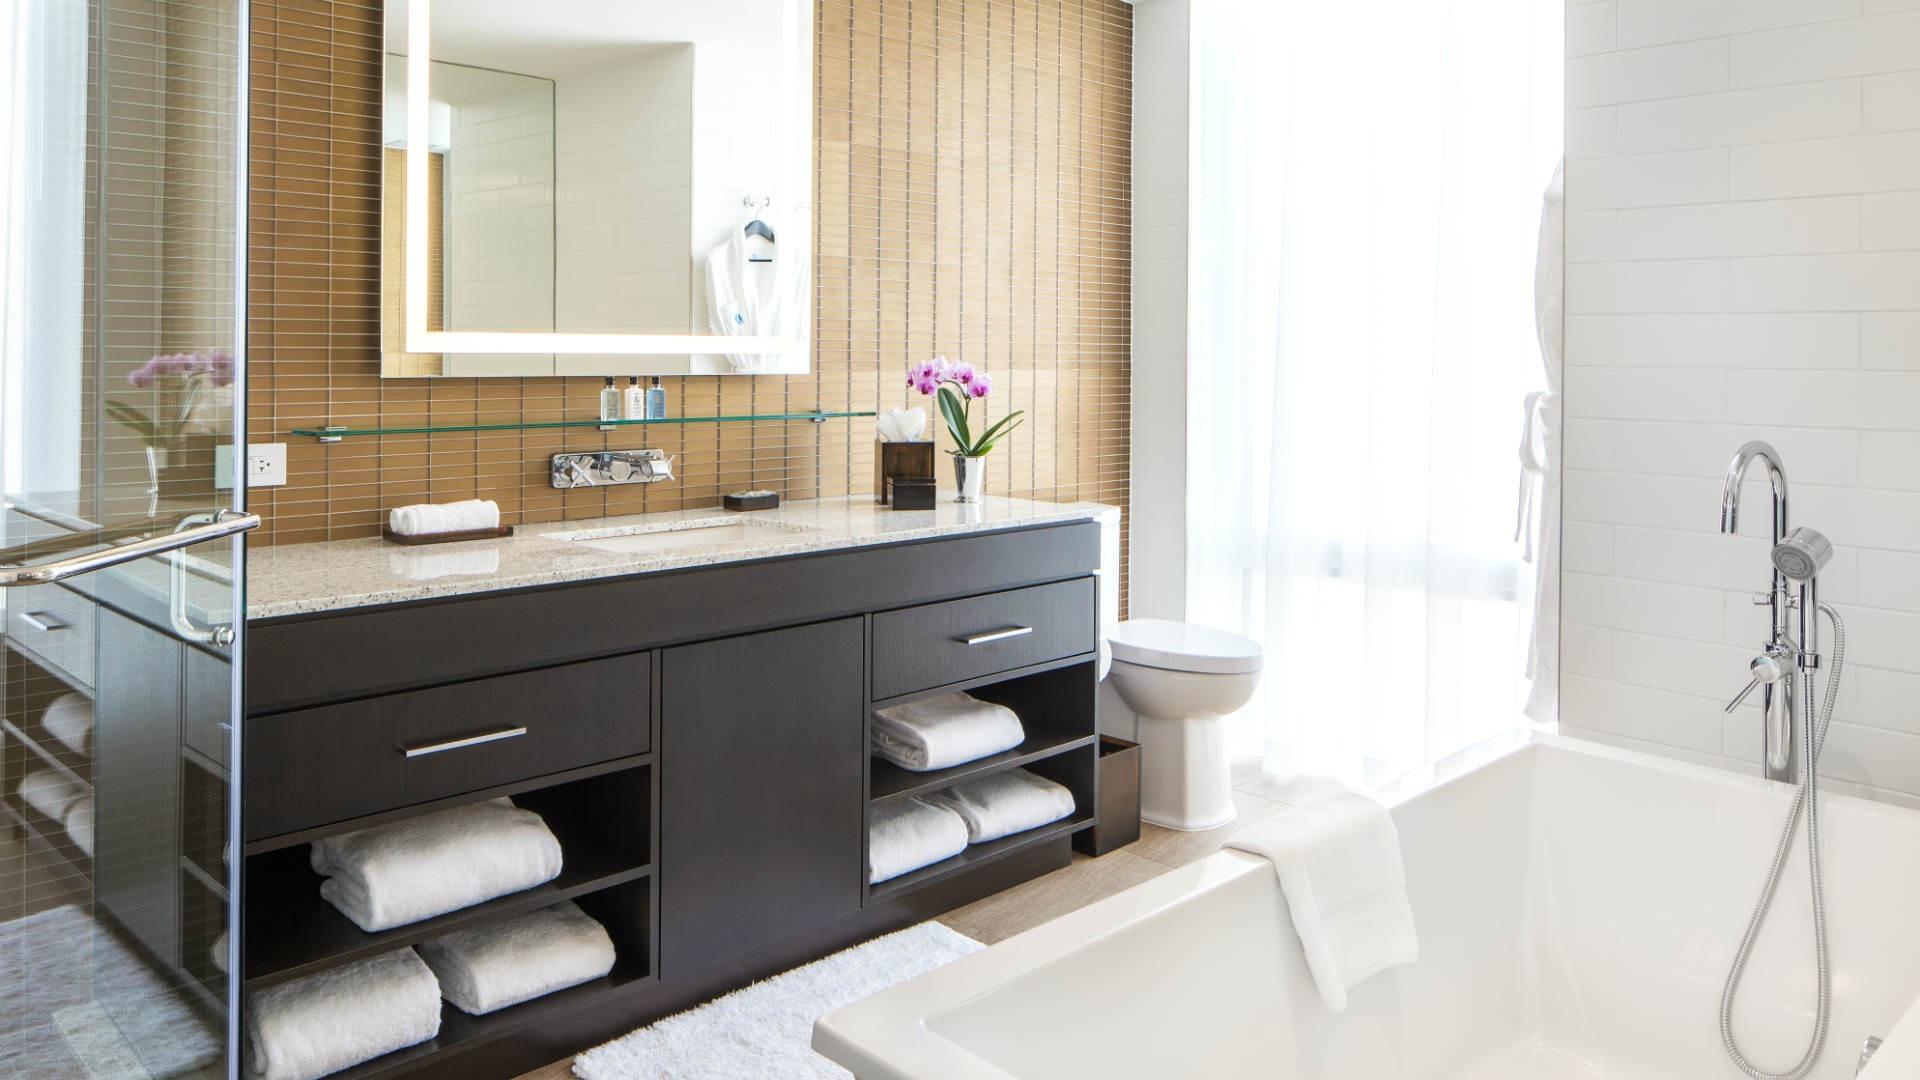 Best hotels Toronto staycation | Hotel X ensuite bathroom